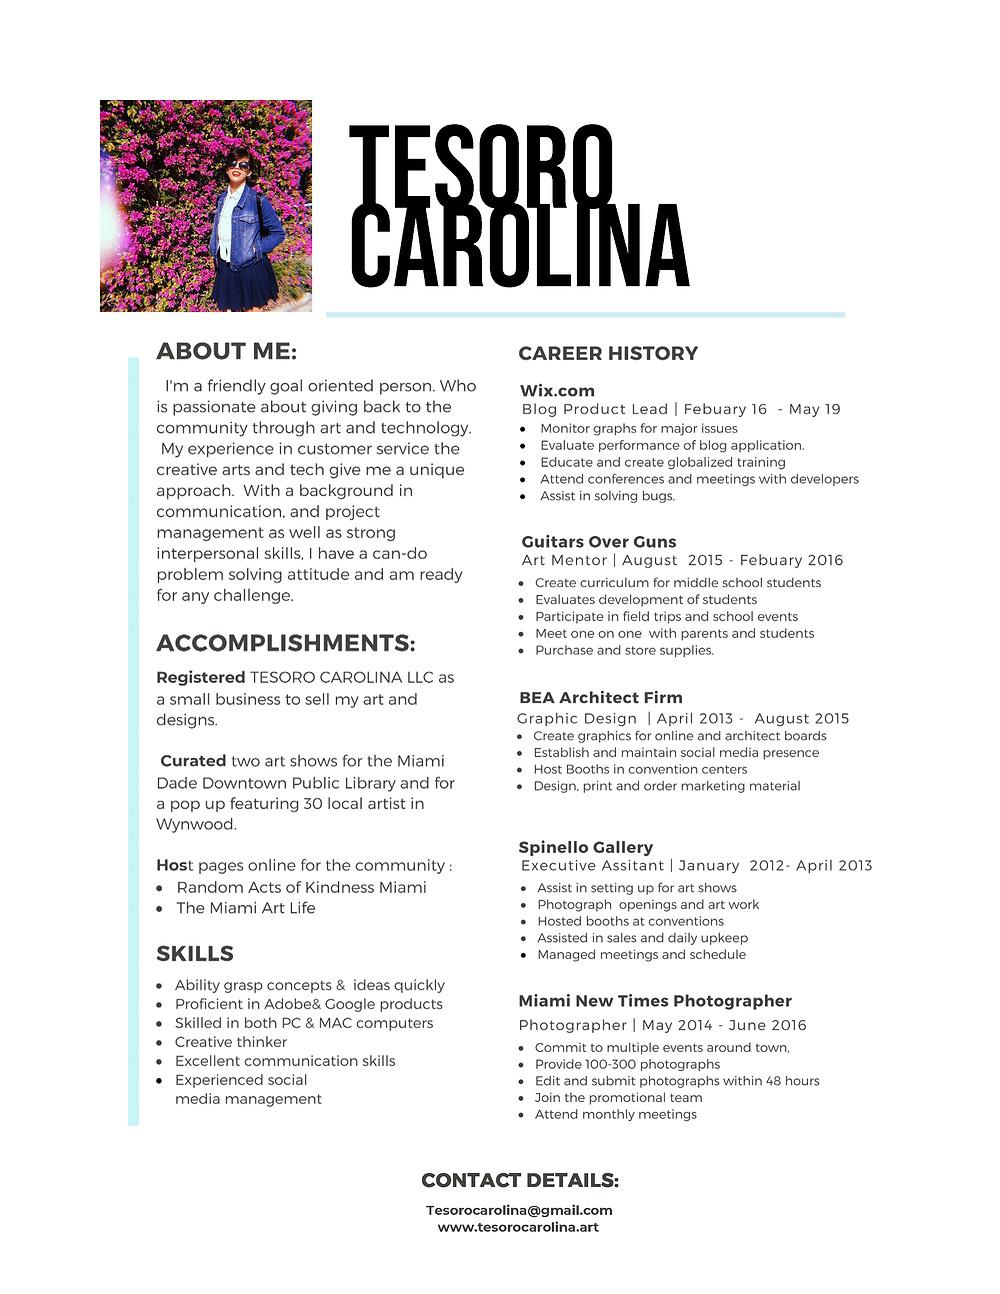 Resume for Tesoro Carolina 2019